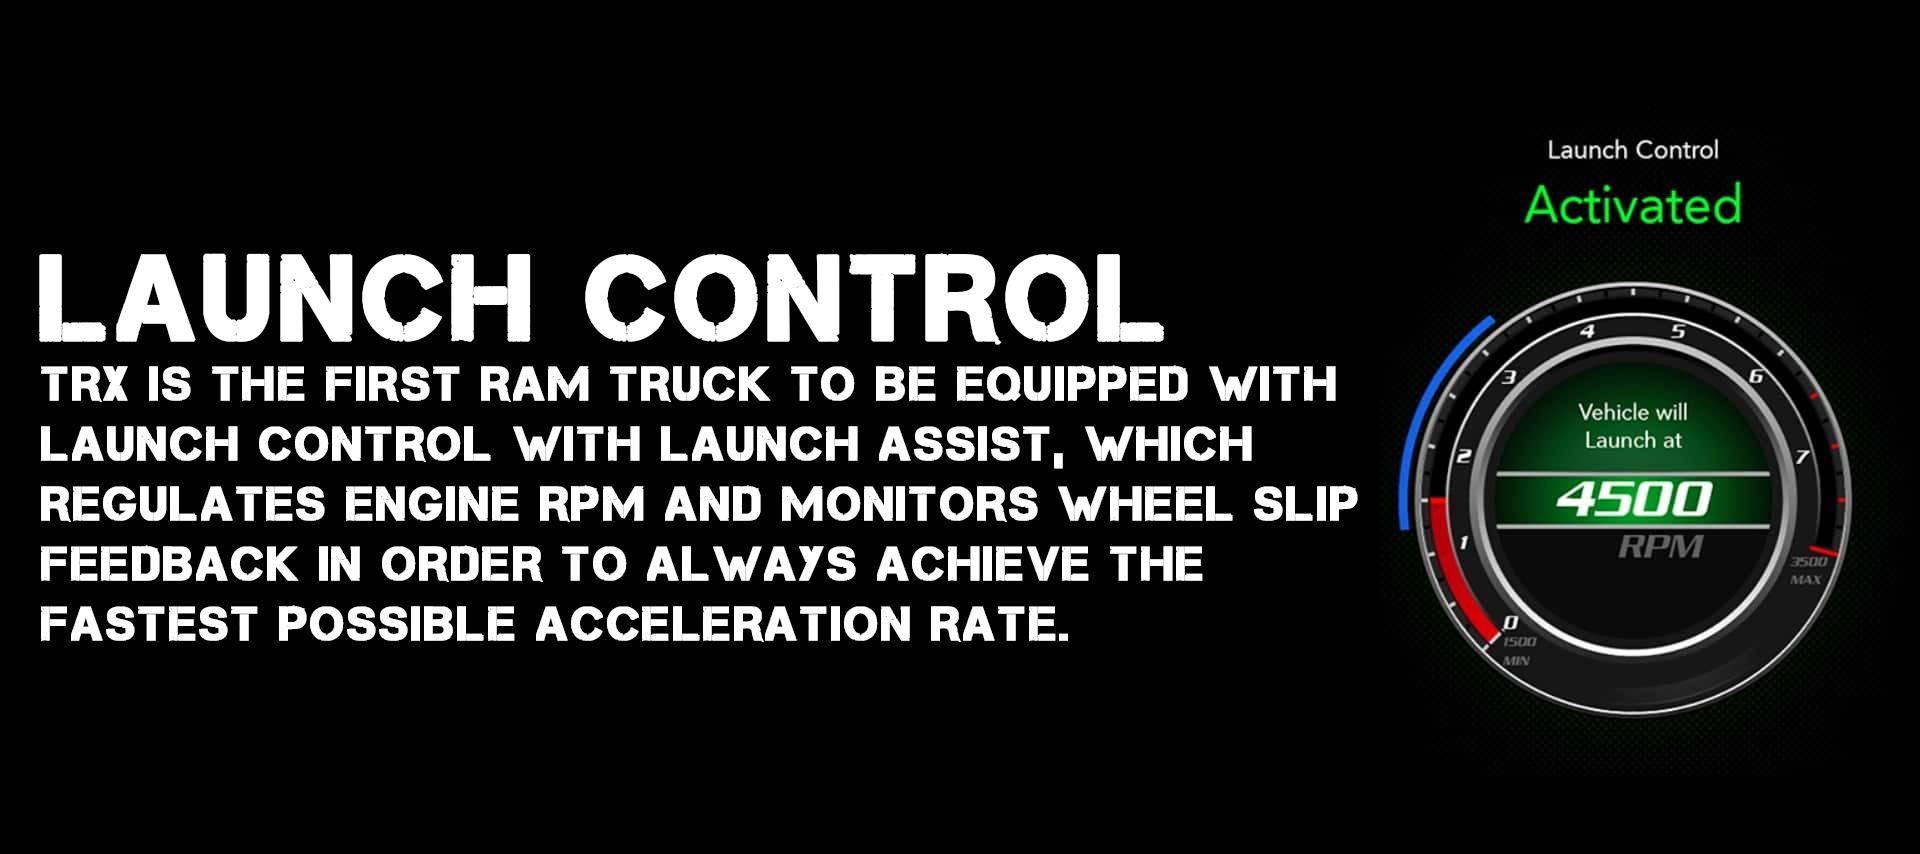 2021 RAM 1500 TRX Launch Control